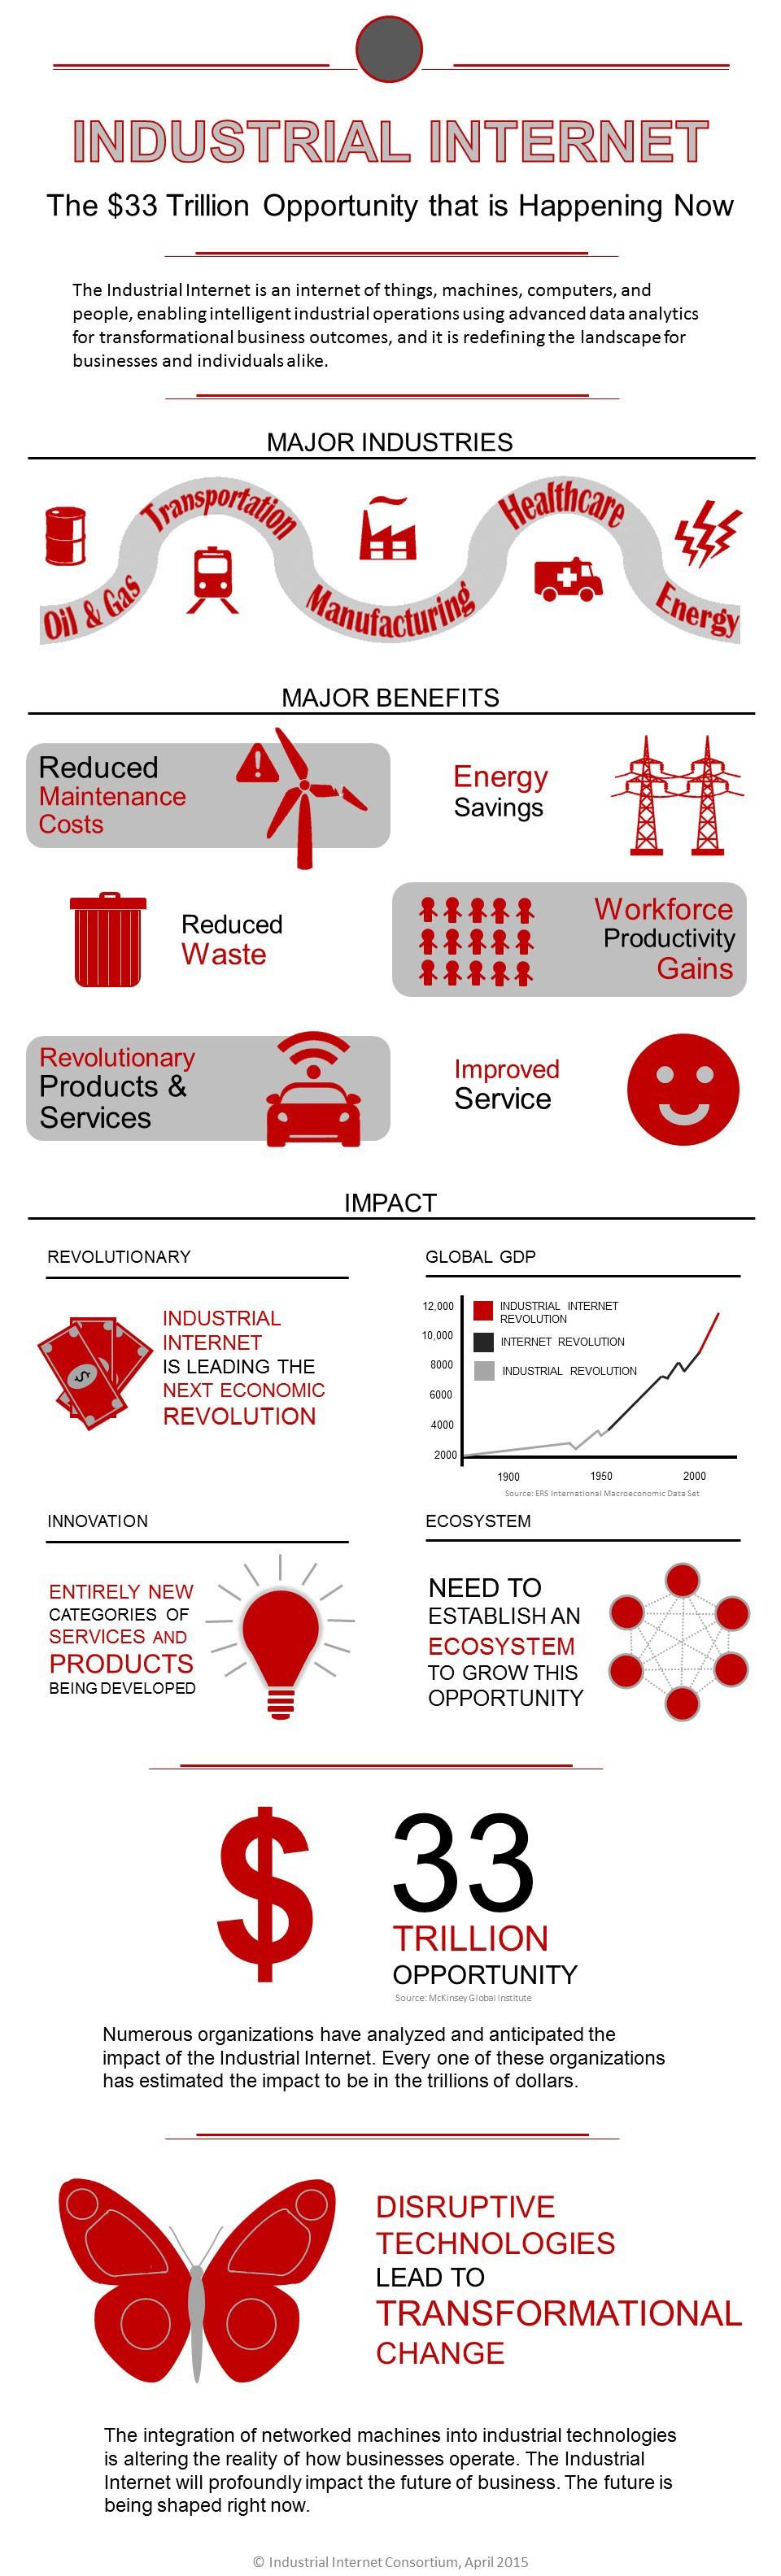 Figure 2. The Industrial Internet Consortium infographic on the IIoT